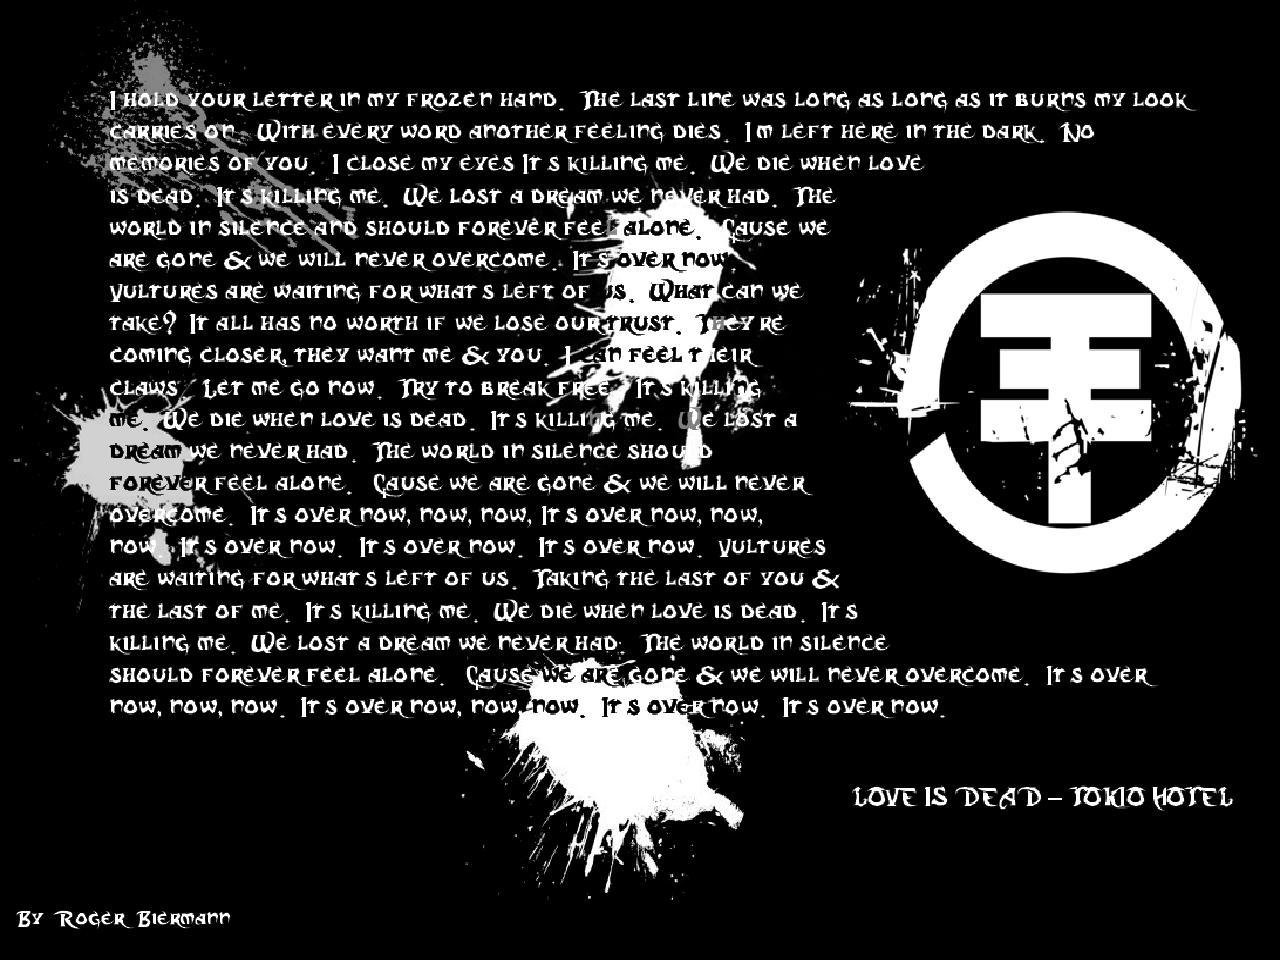 Tokio Hotel Lyric Wallpaper By Vanskof On Deviantart